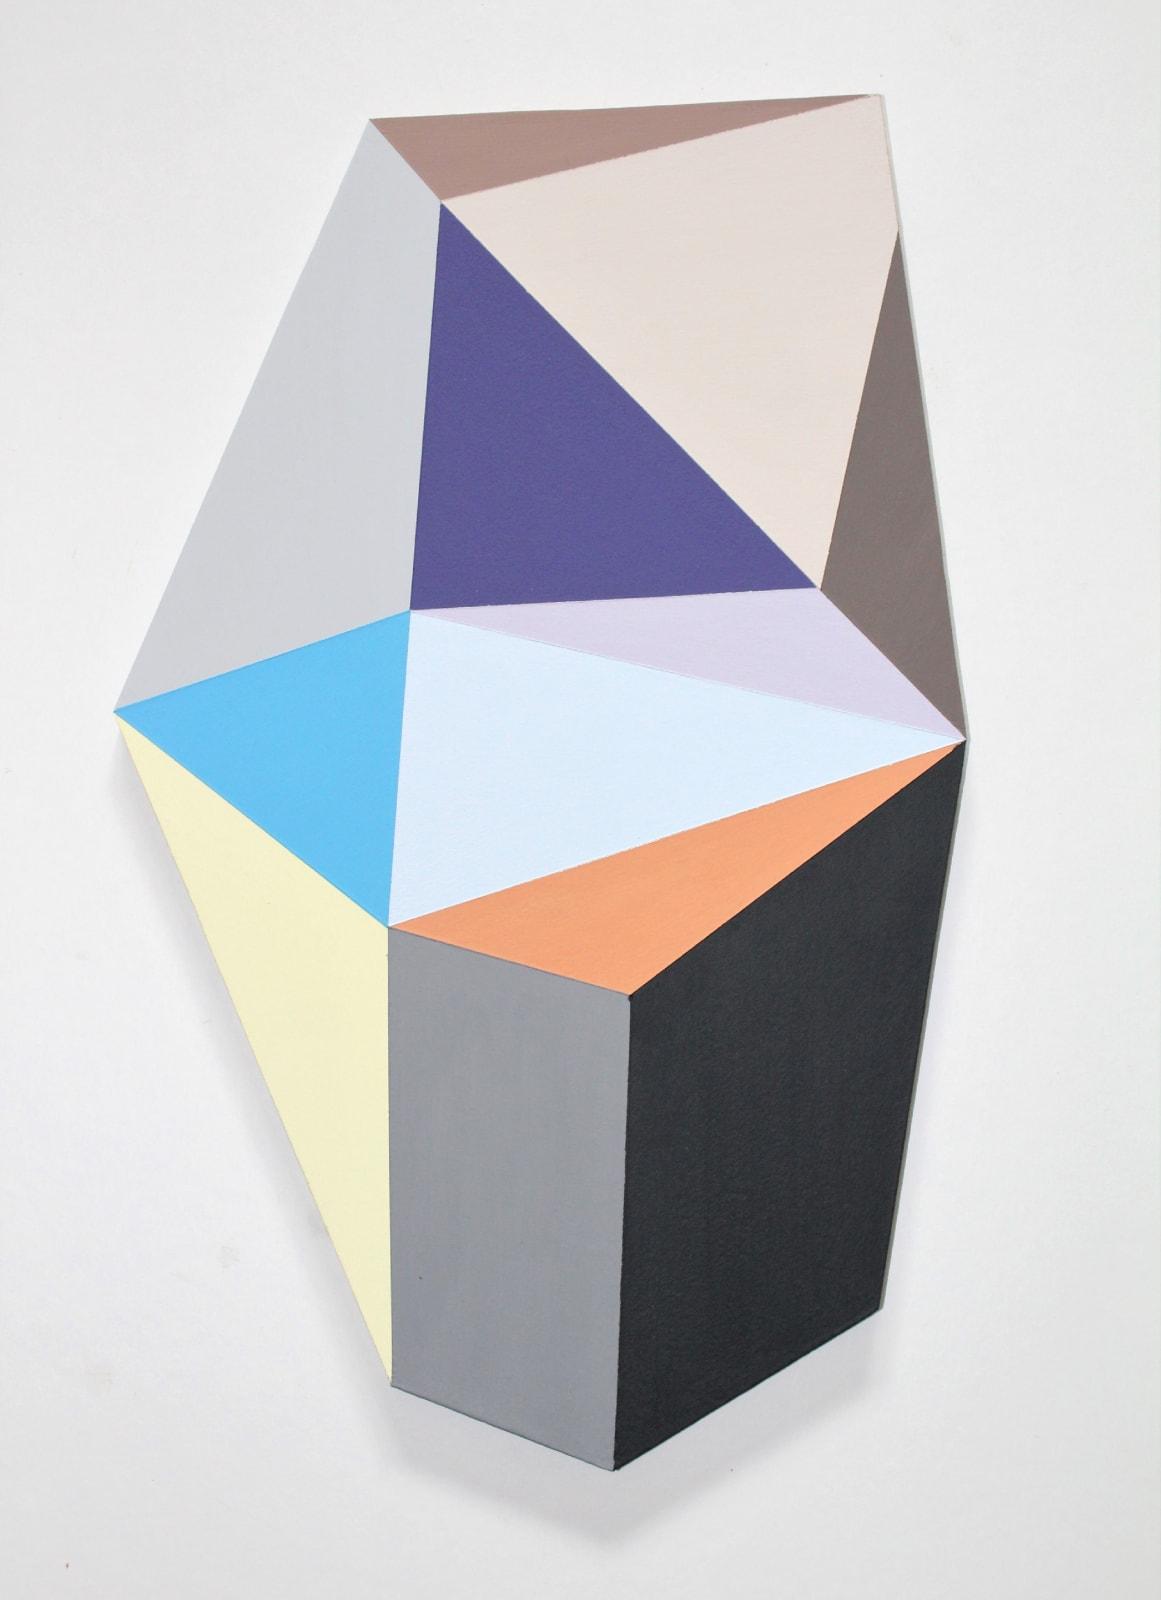 Megan Burns,  Altered space 0.10,  emulsion on board,  41 x 25 cm